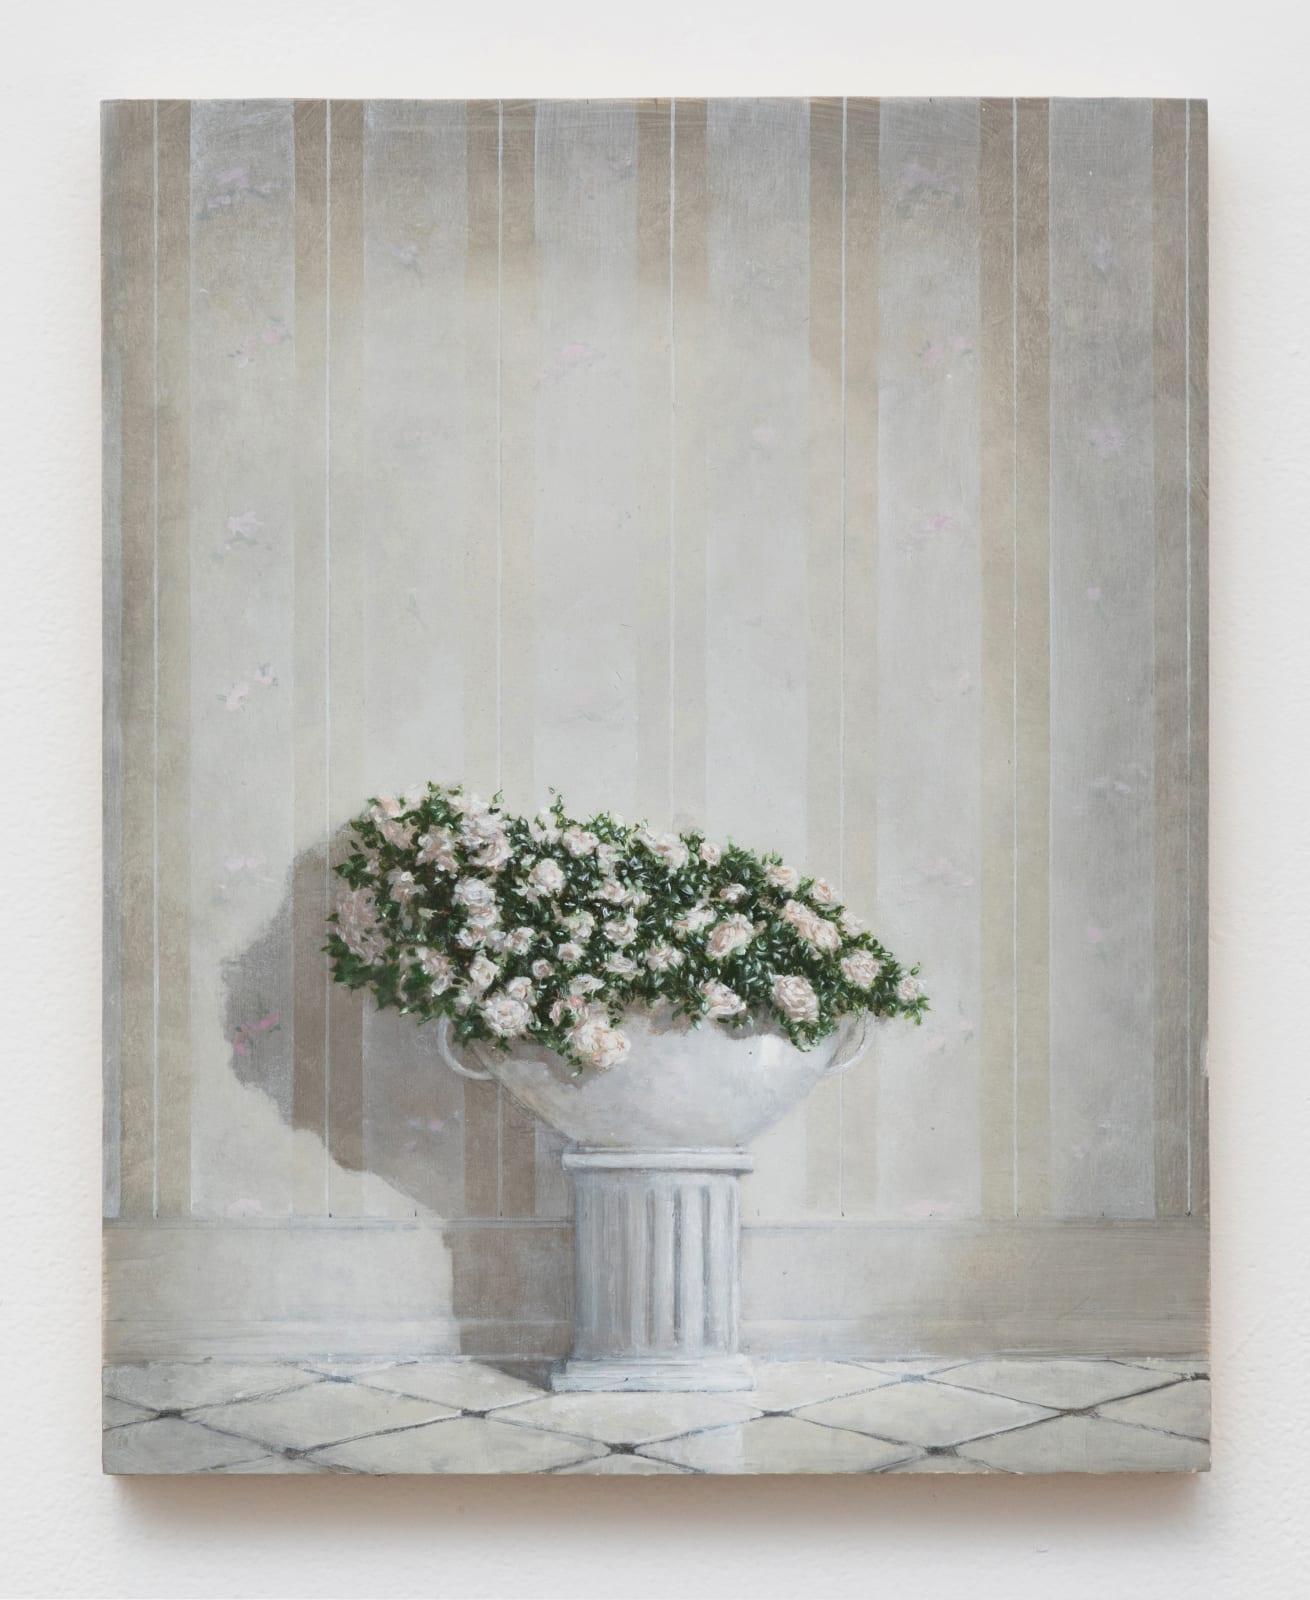 Quentin James McCaffrey, Bouquet with Column, 2020